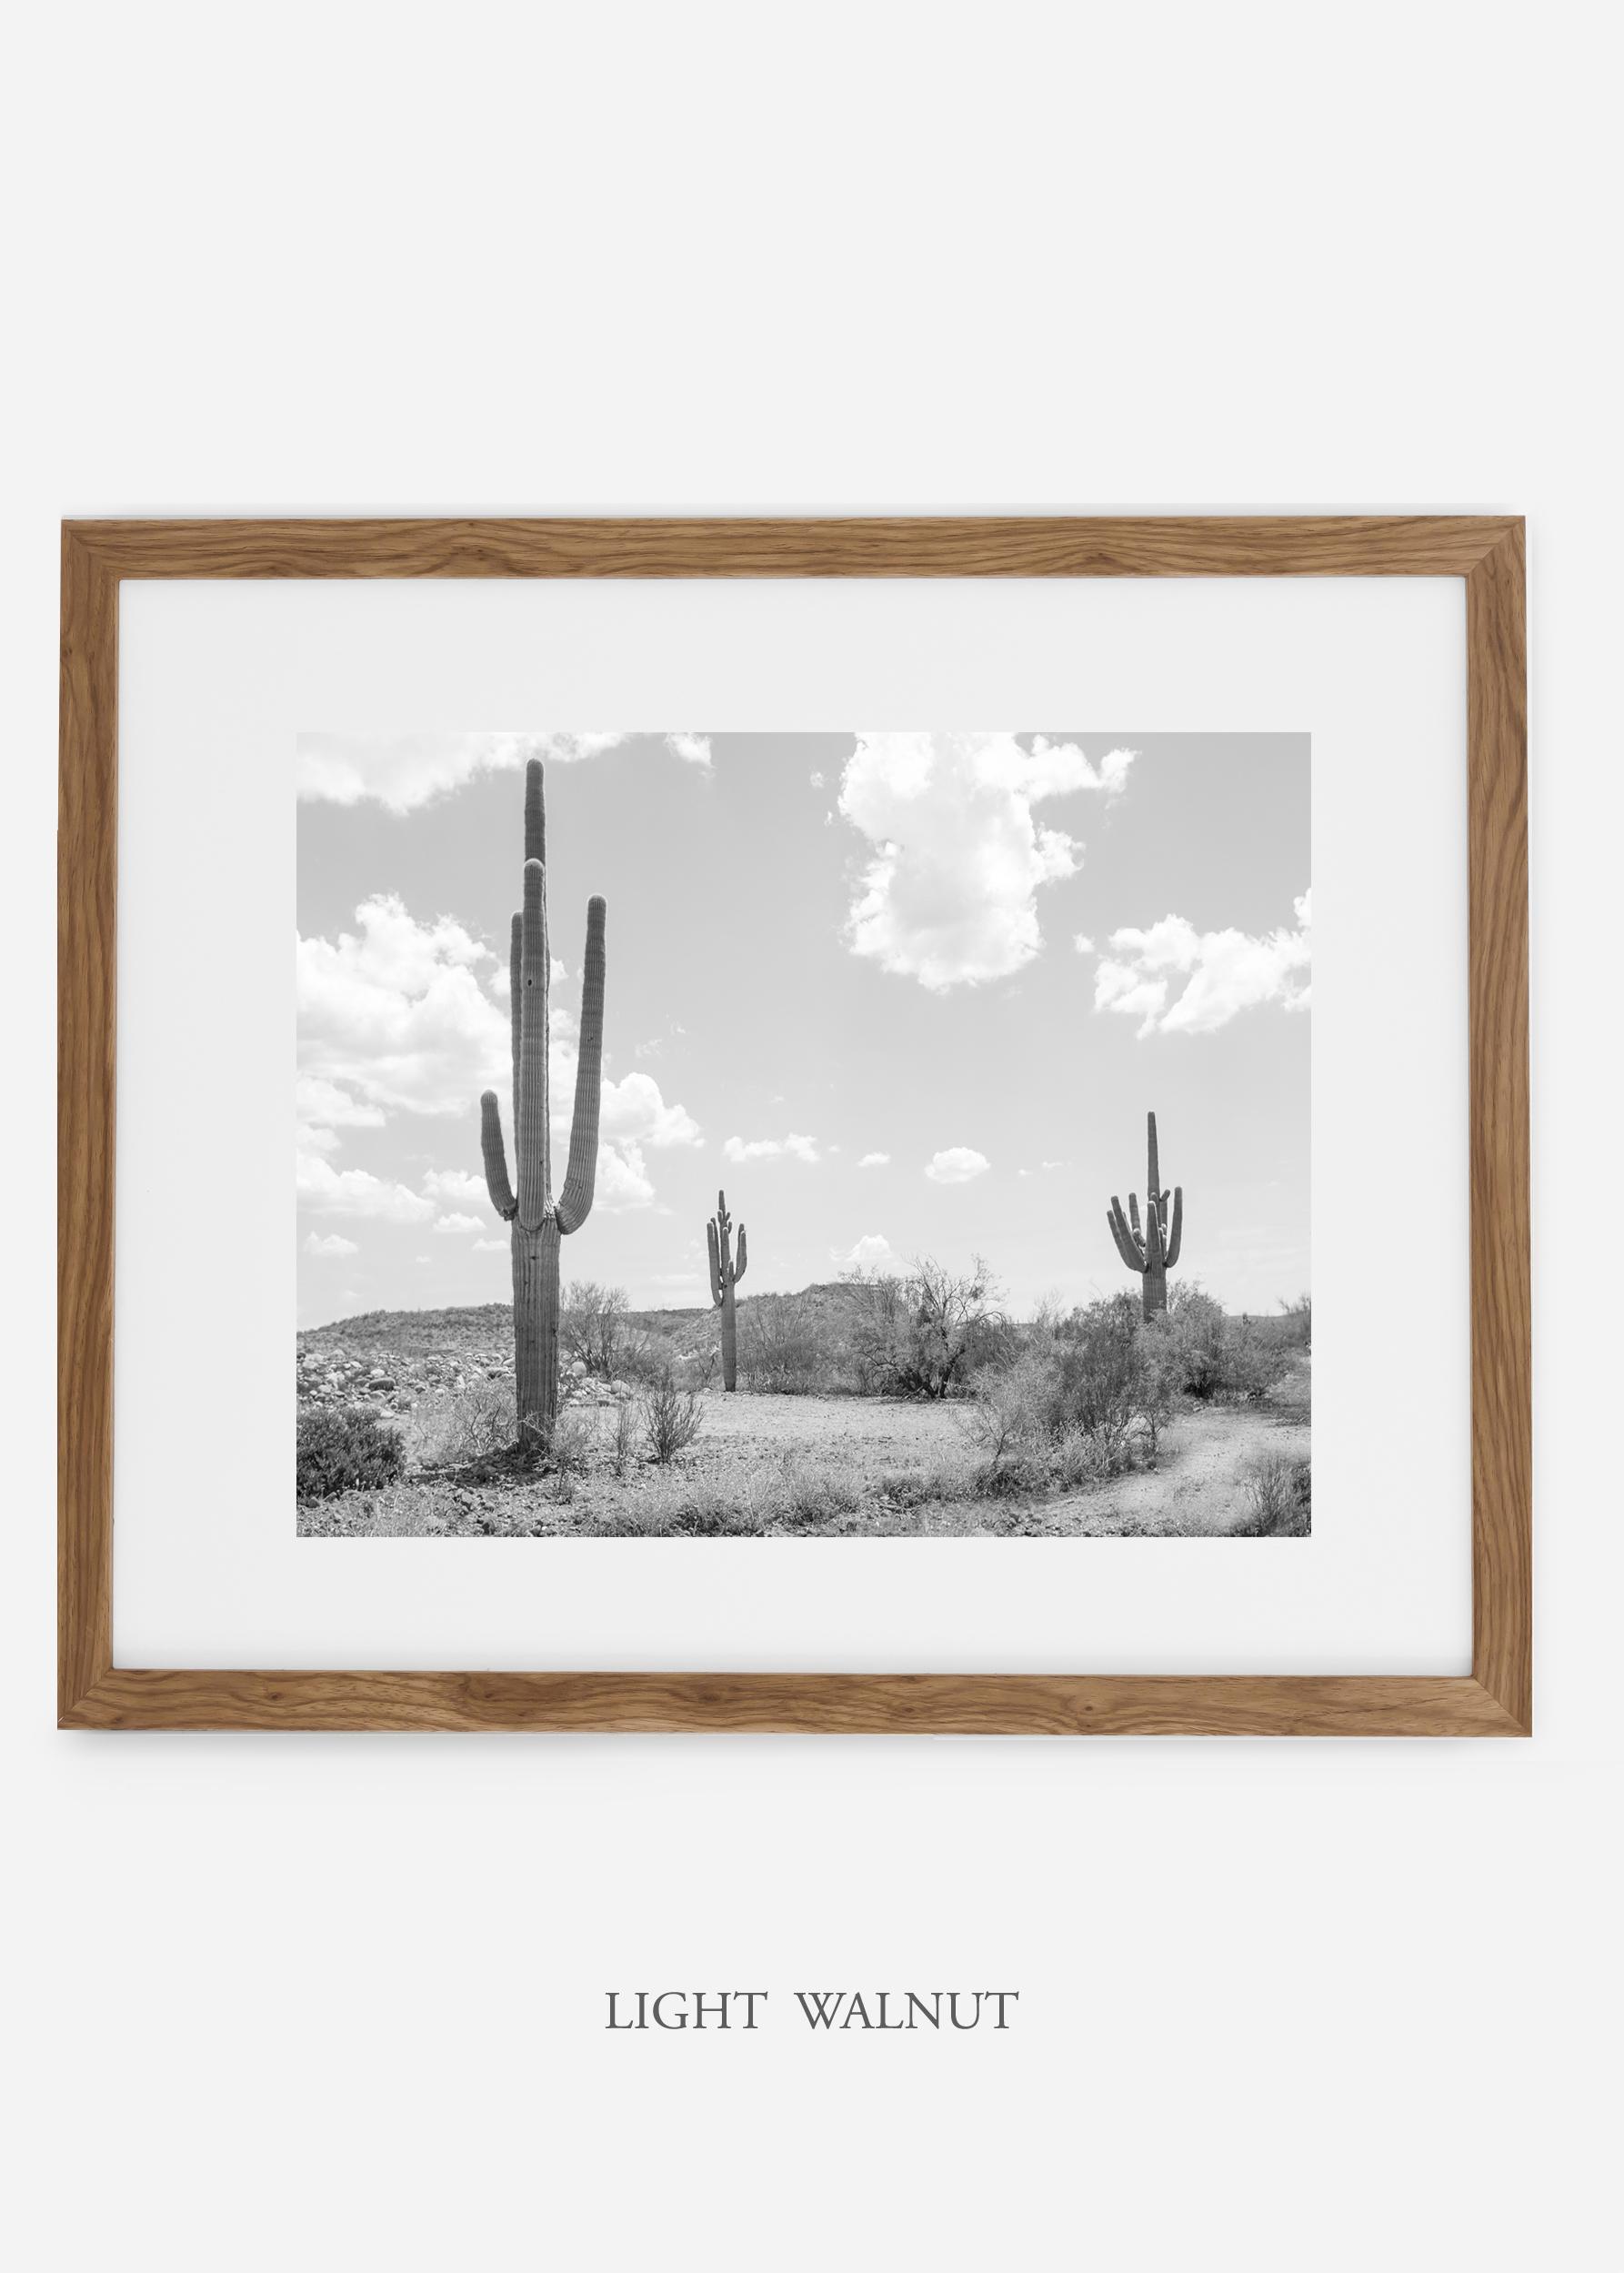 wildercalifornia_lightwalnutframe_threesaguaro_cactus_art_interiordesign.jpg